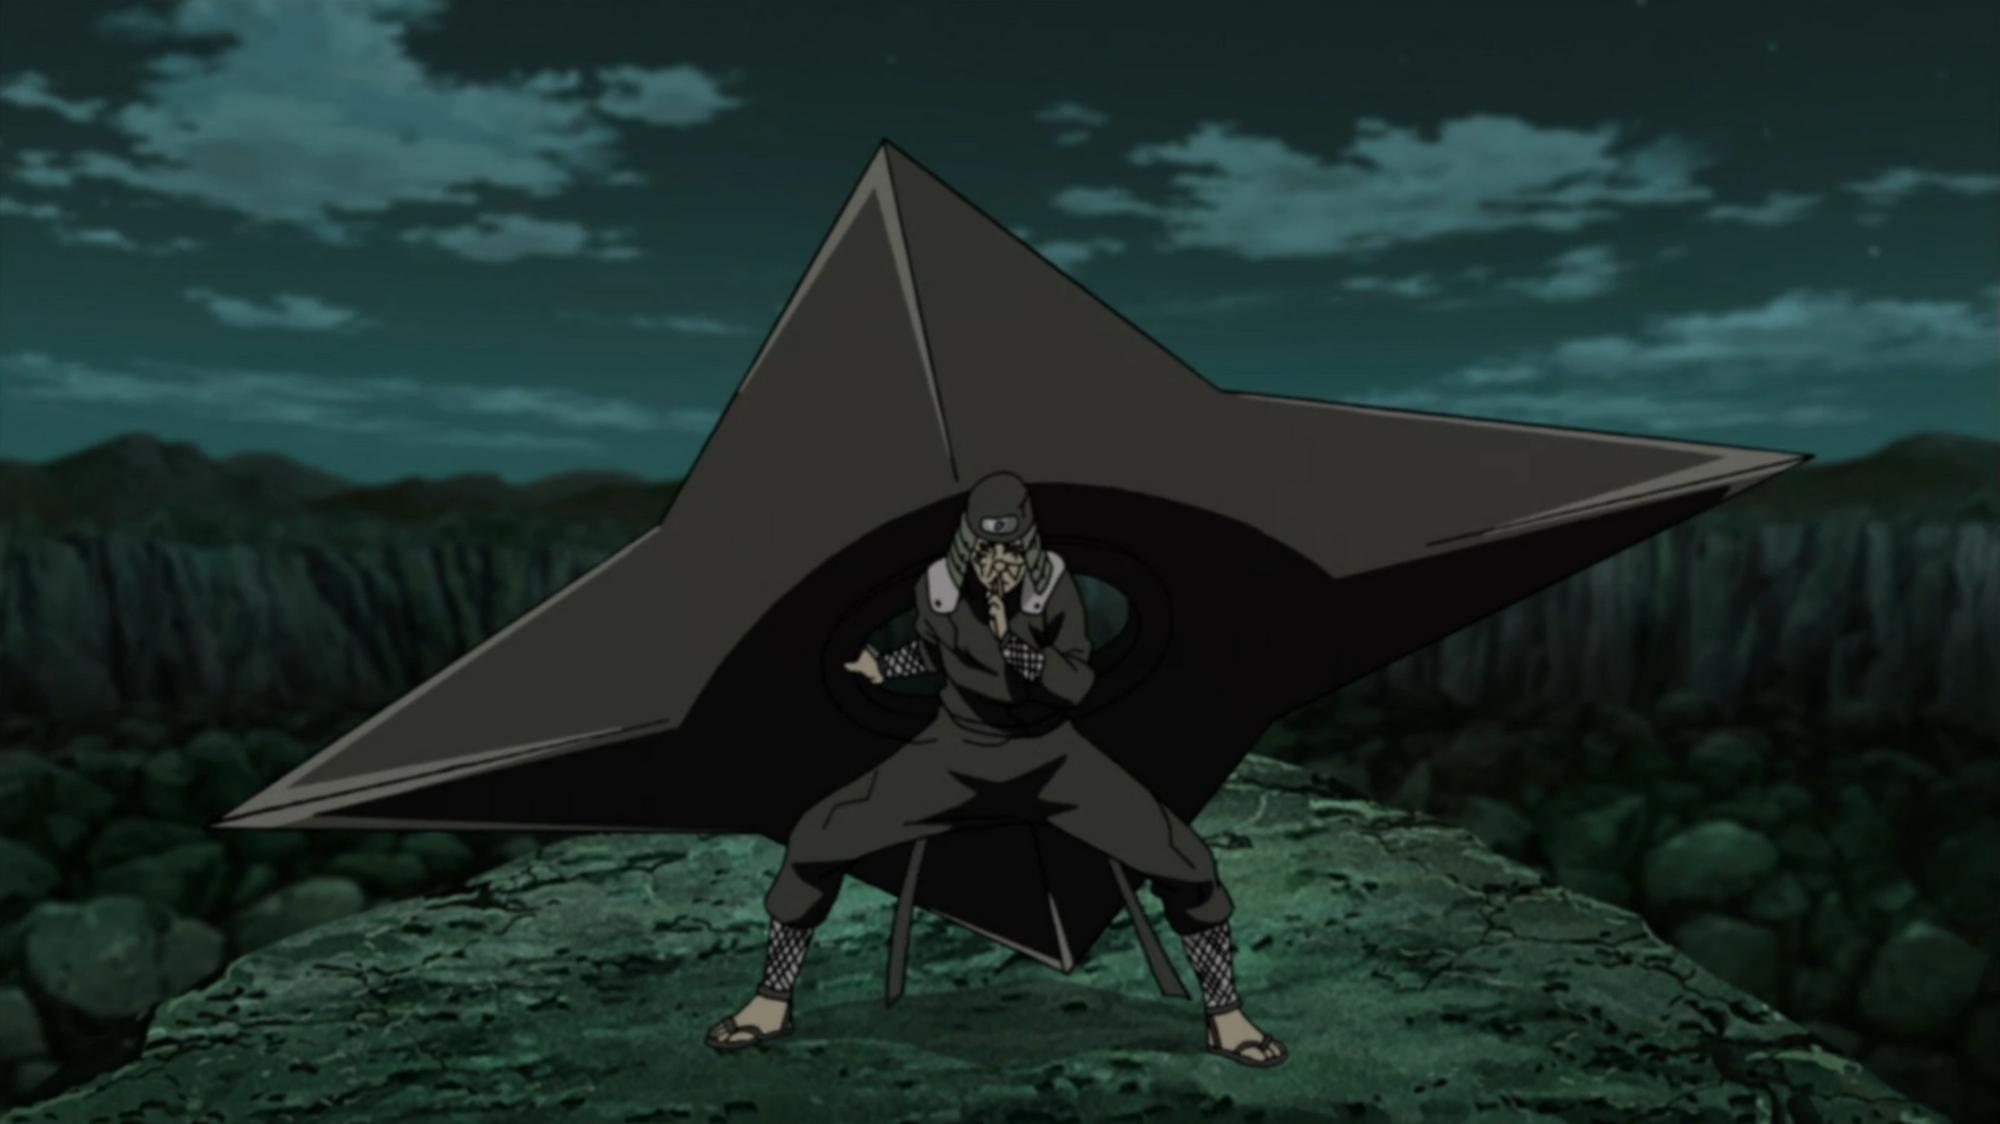 fūma shuriken narutopedia fandom powered by wikia